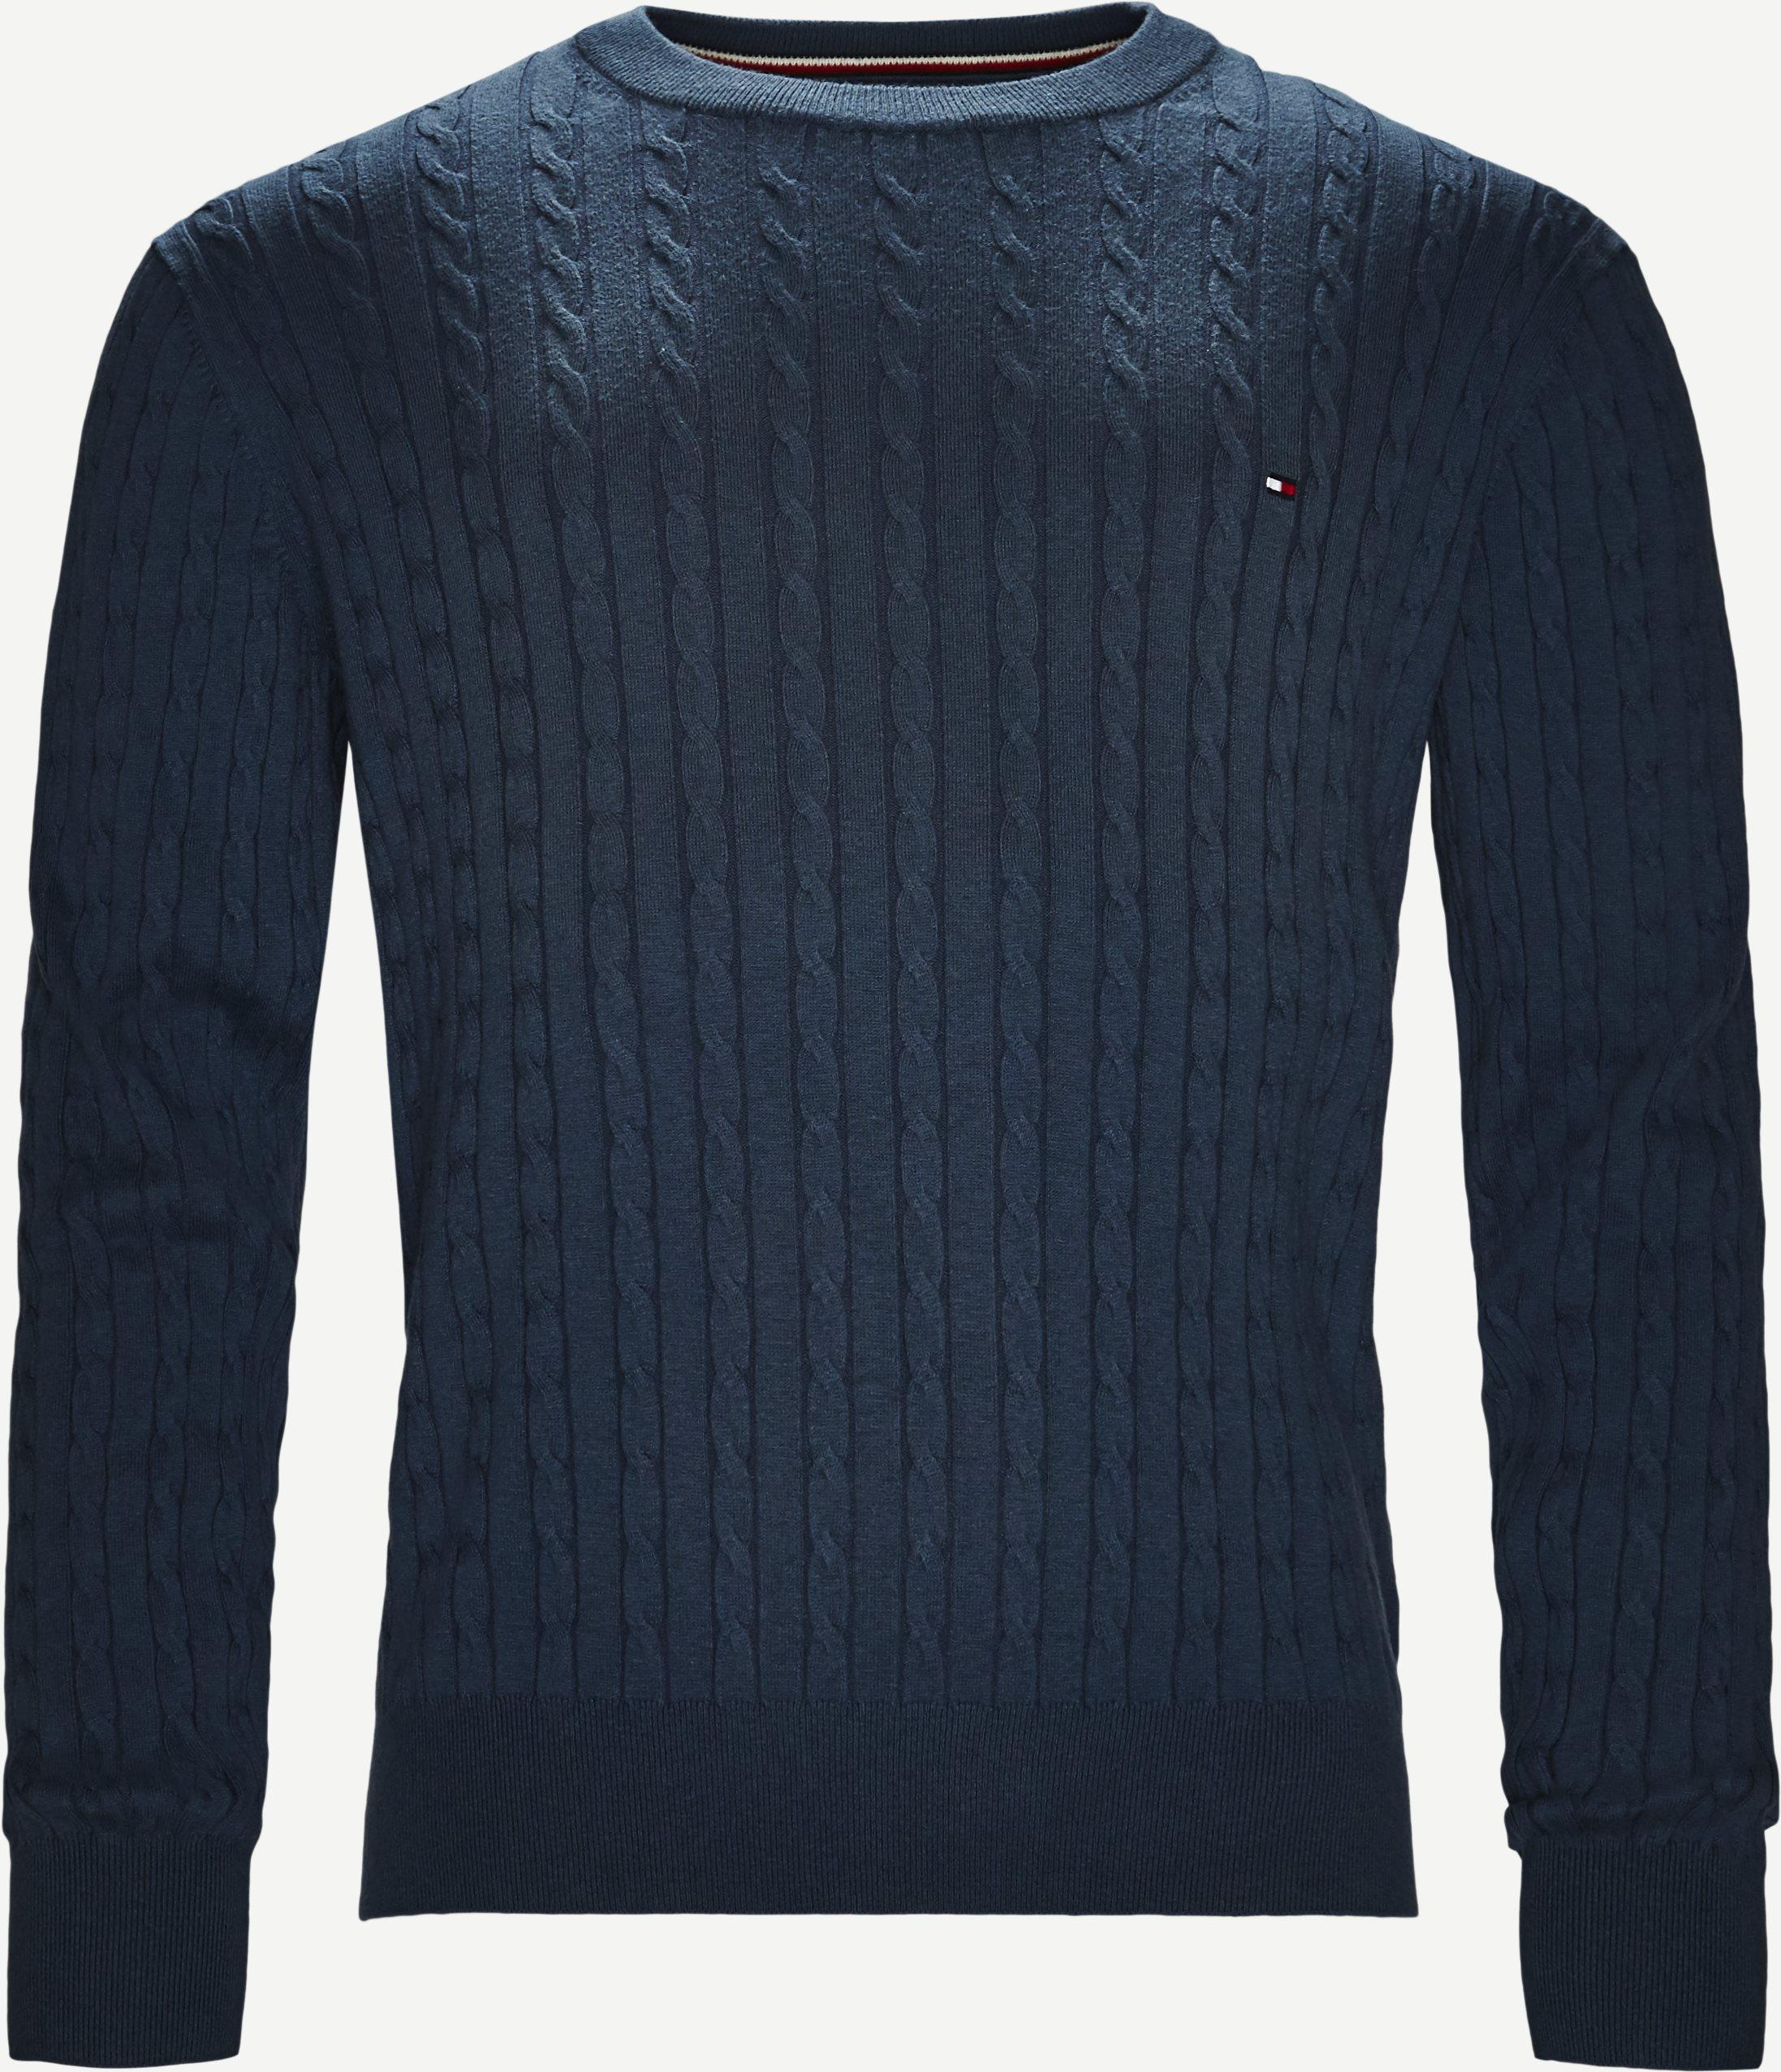 Strickwaren - Regular fit - Jeans-Blau